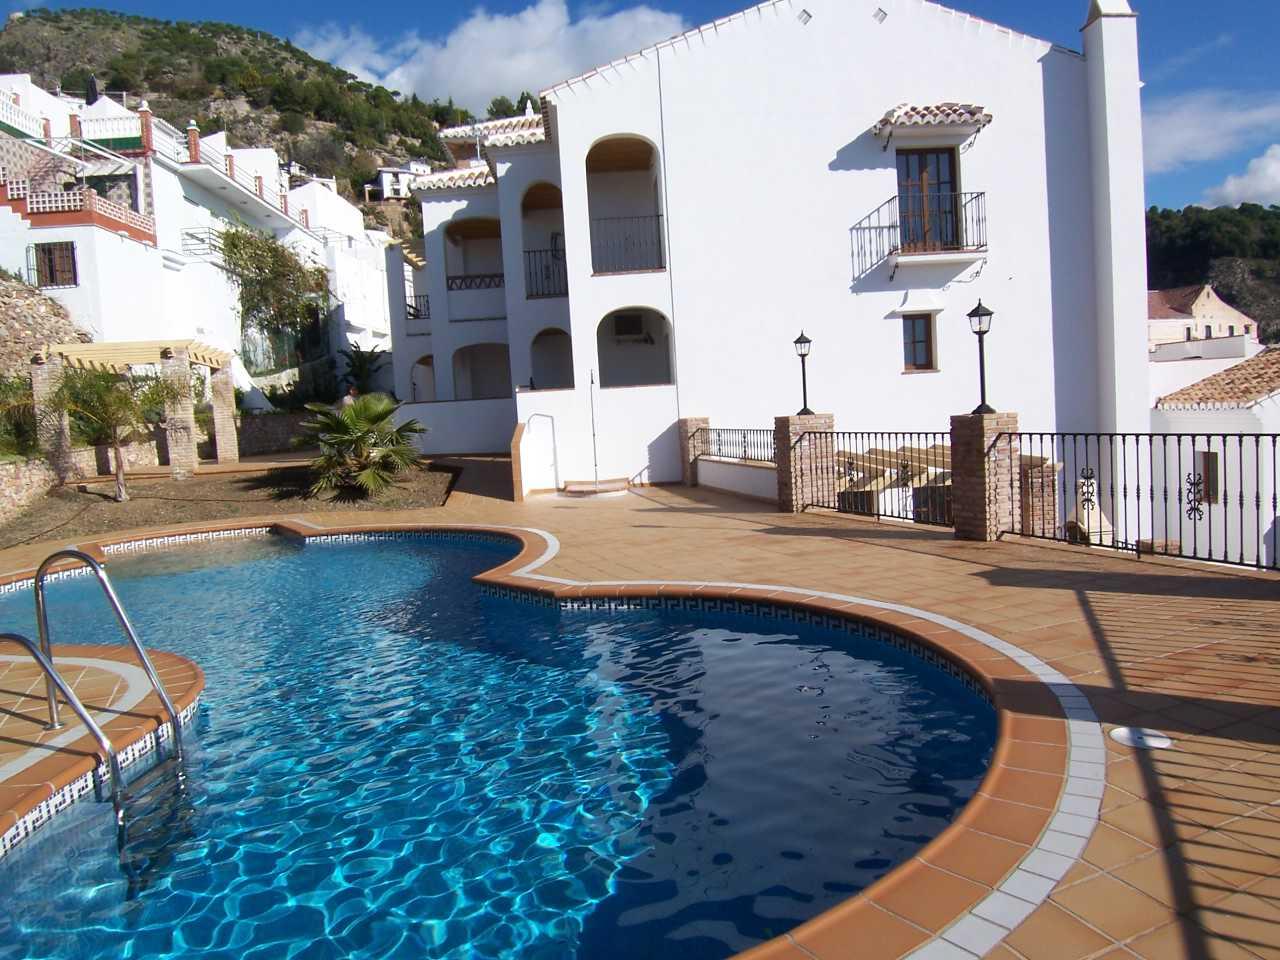 Apartment for rent in Frigiliana - Costa del Sol East